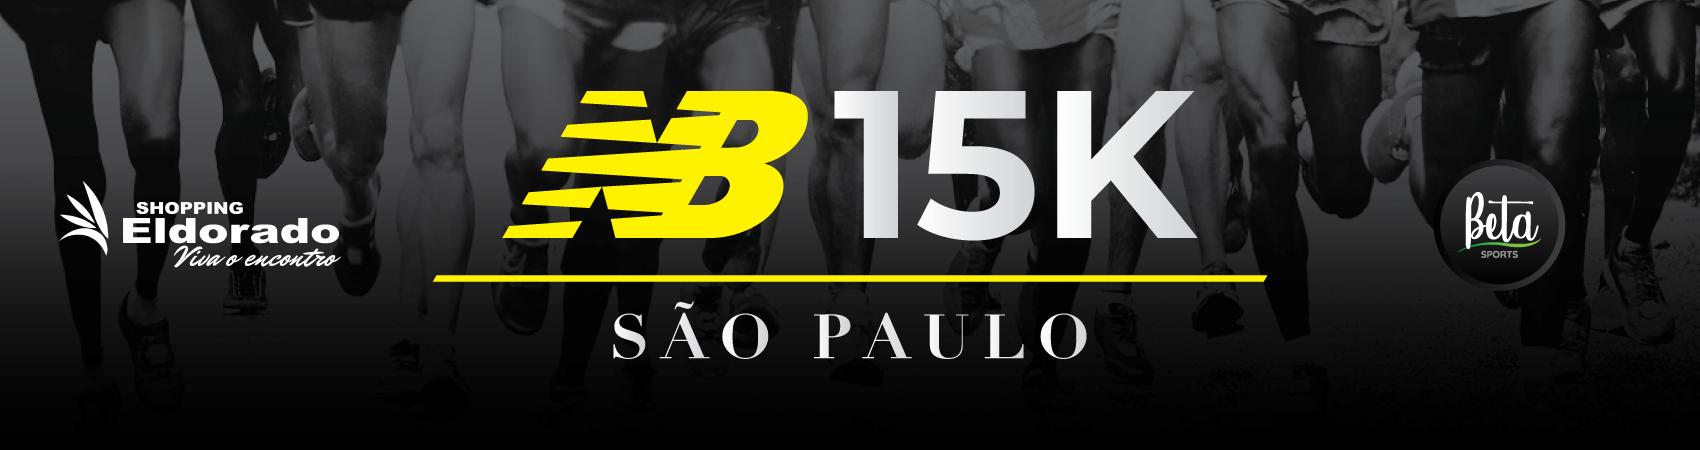 NEW BALANCE 15K SÃO PAULO 2019